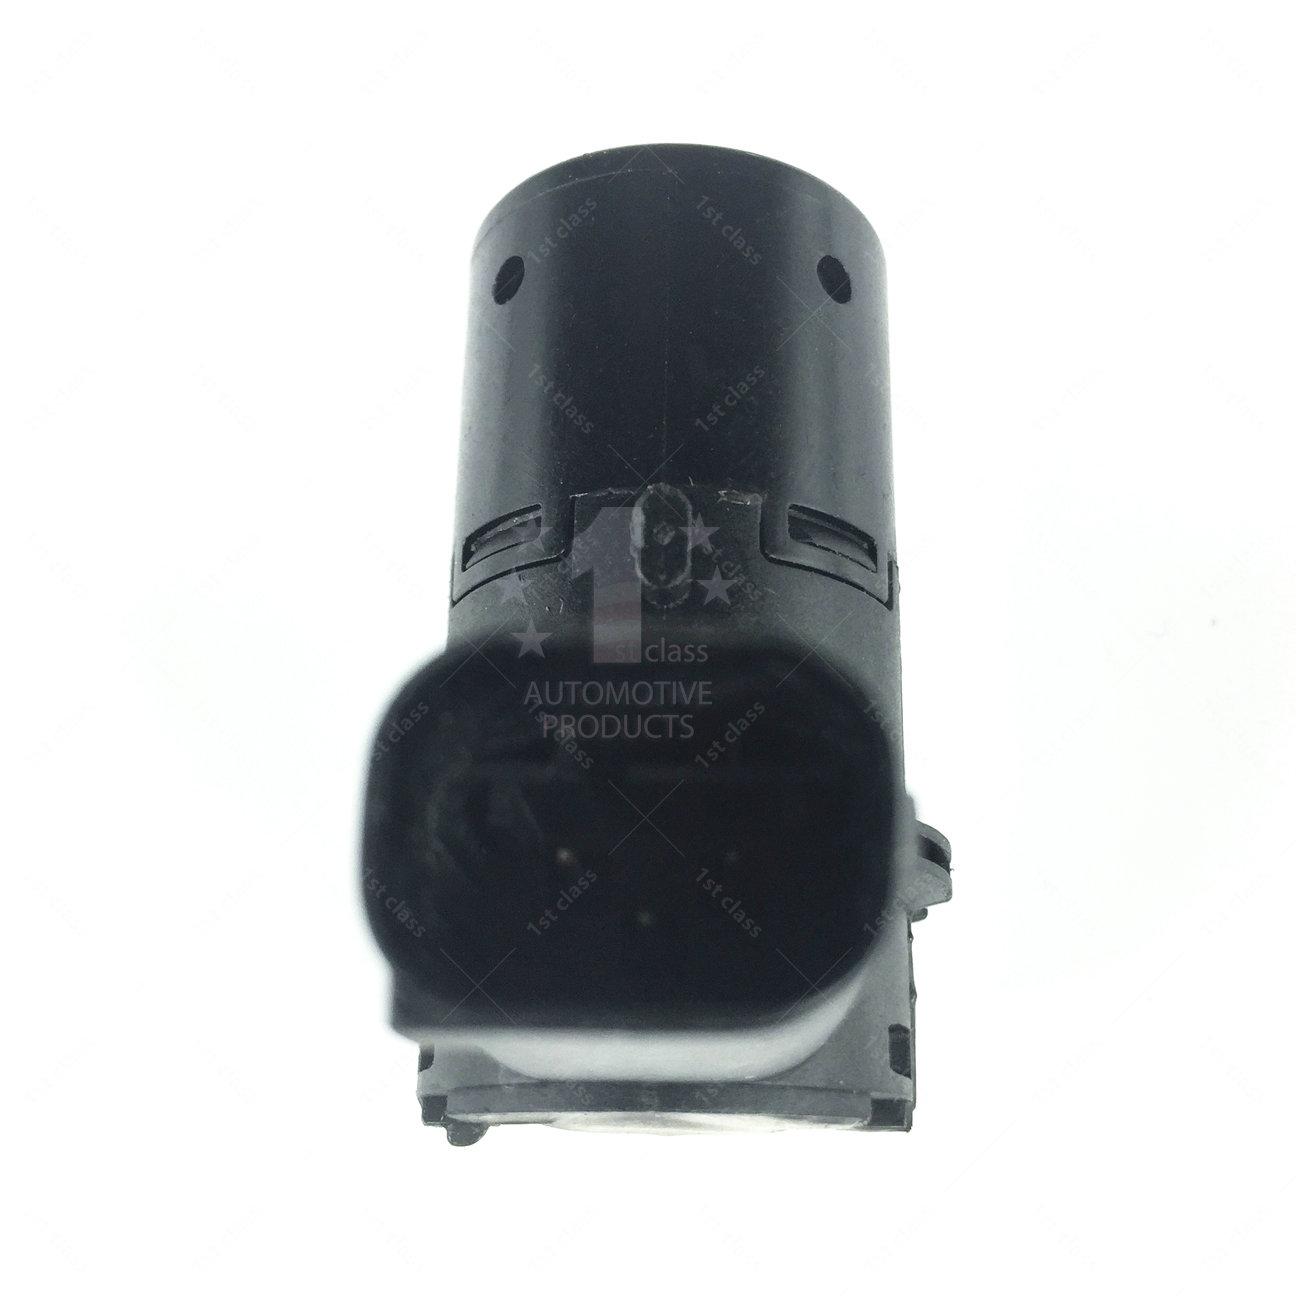 NEW REAR BUMPER PARKING SENSOR FOR VOLVO OEM 8641281 PS864A181